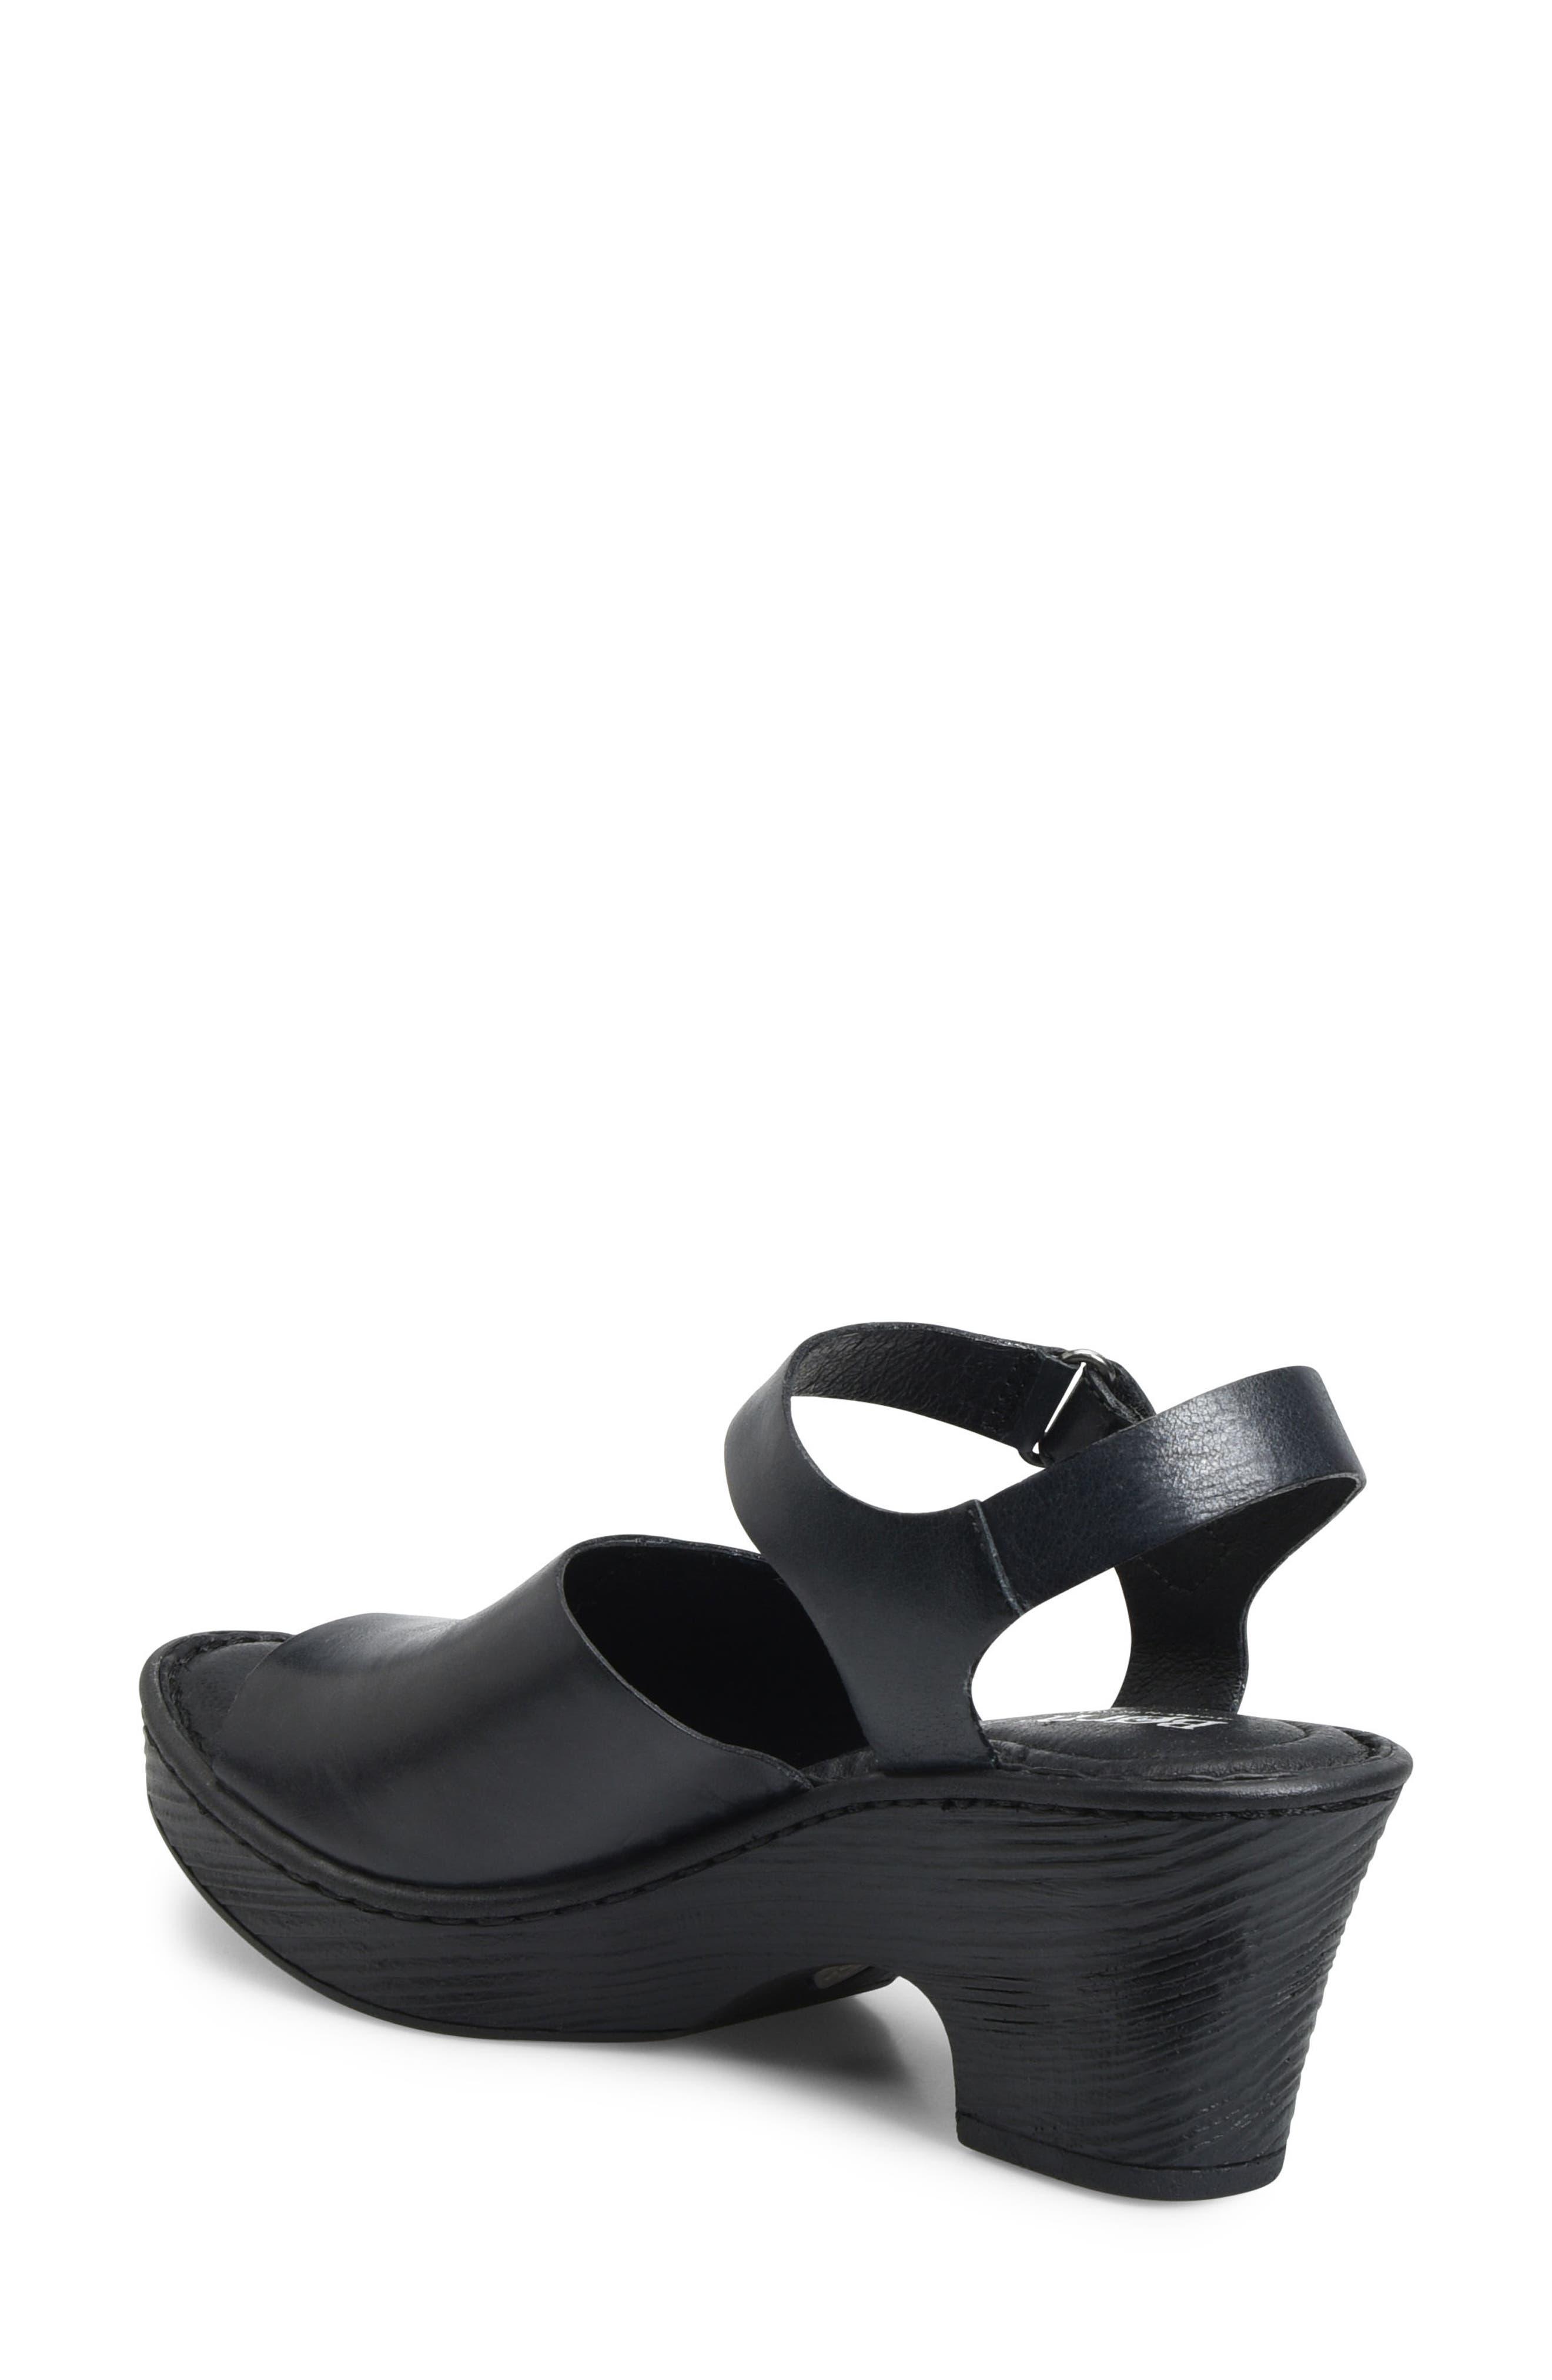 Canna Platform Sandal,                             Alternate thumbnail 2, color,                             001